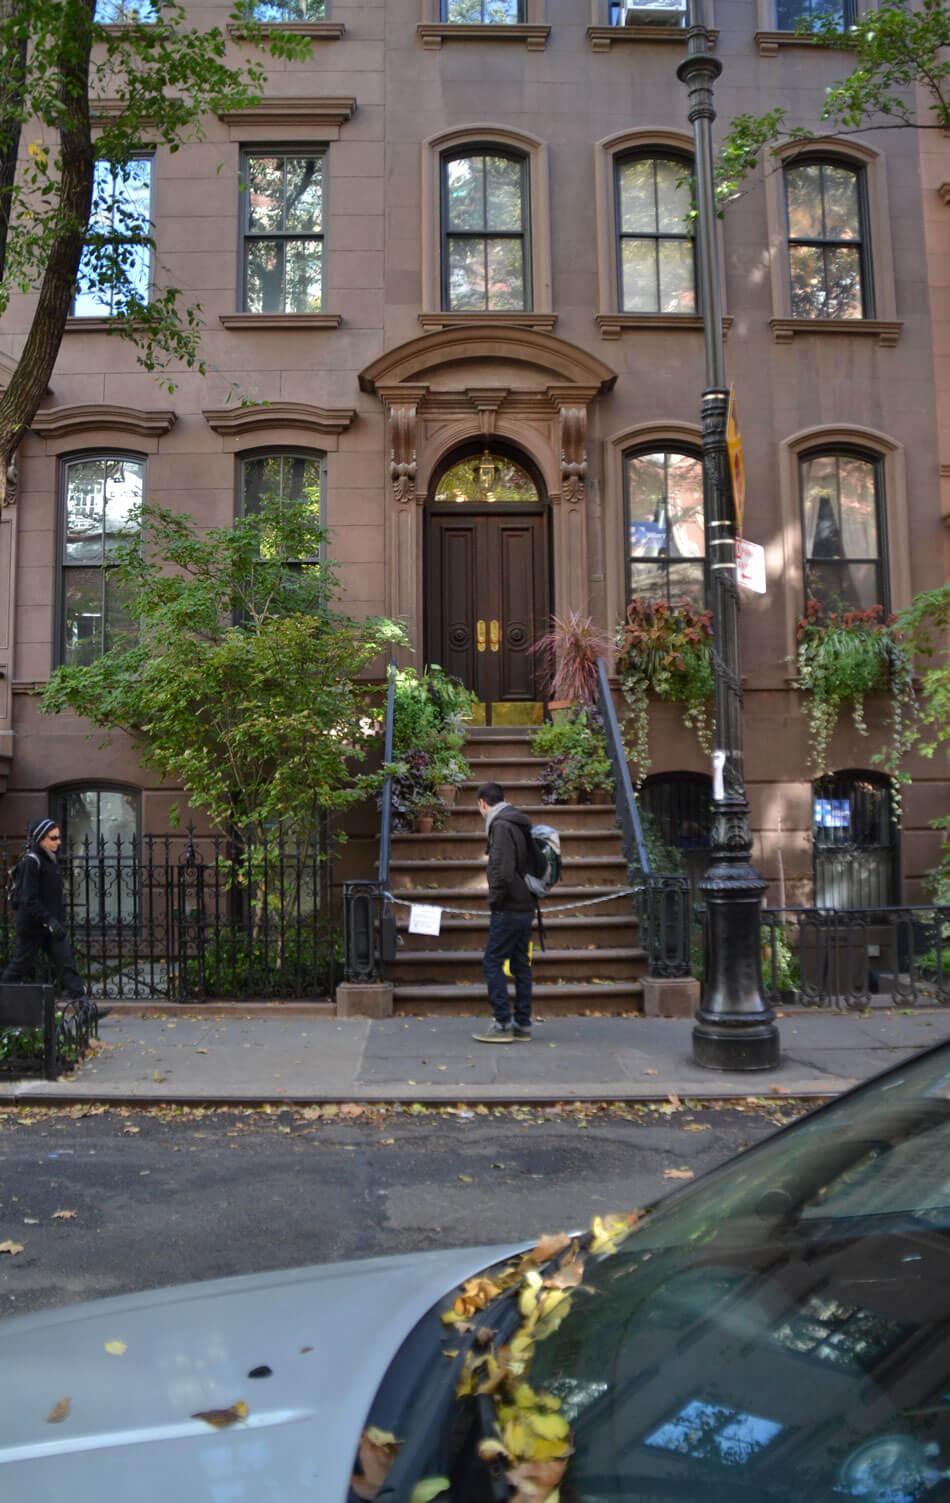 apartamento carrir bradshaw sexo en nueva york